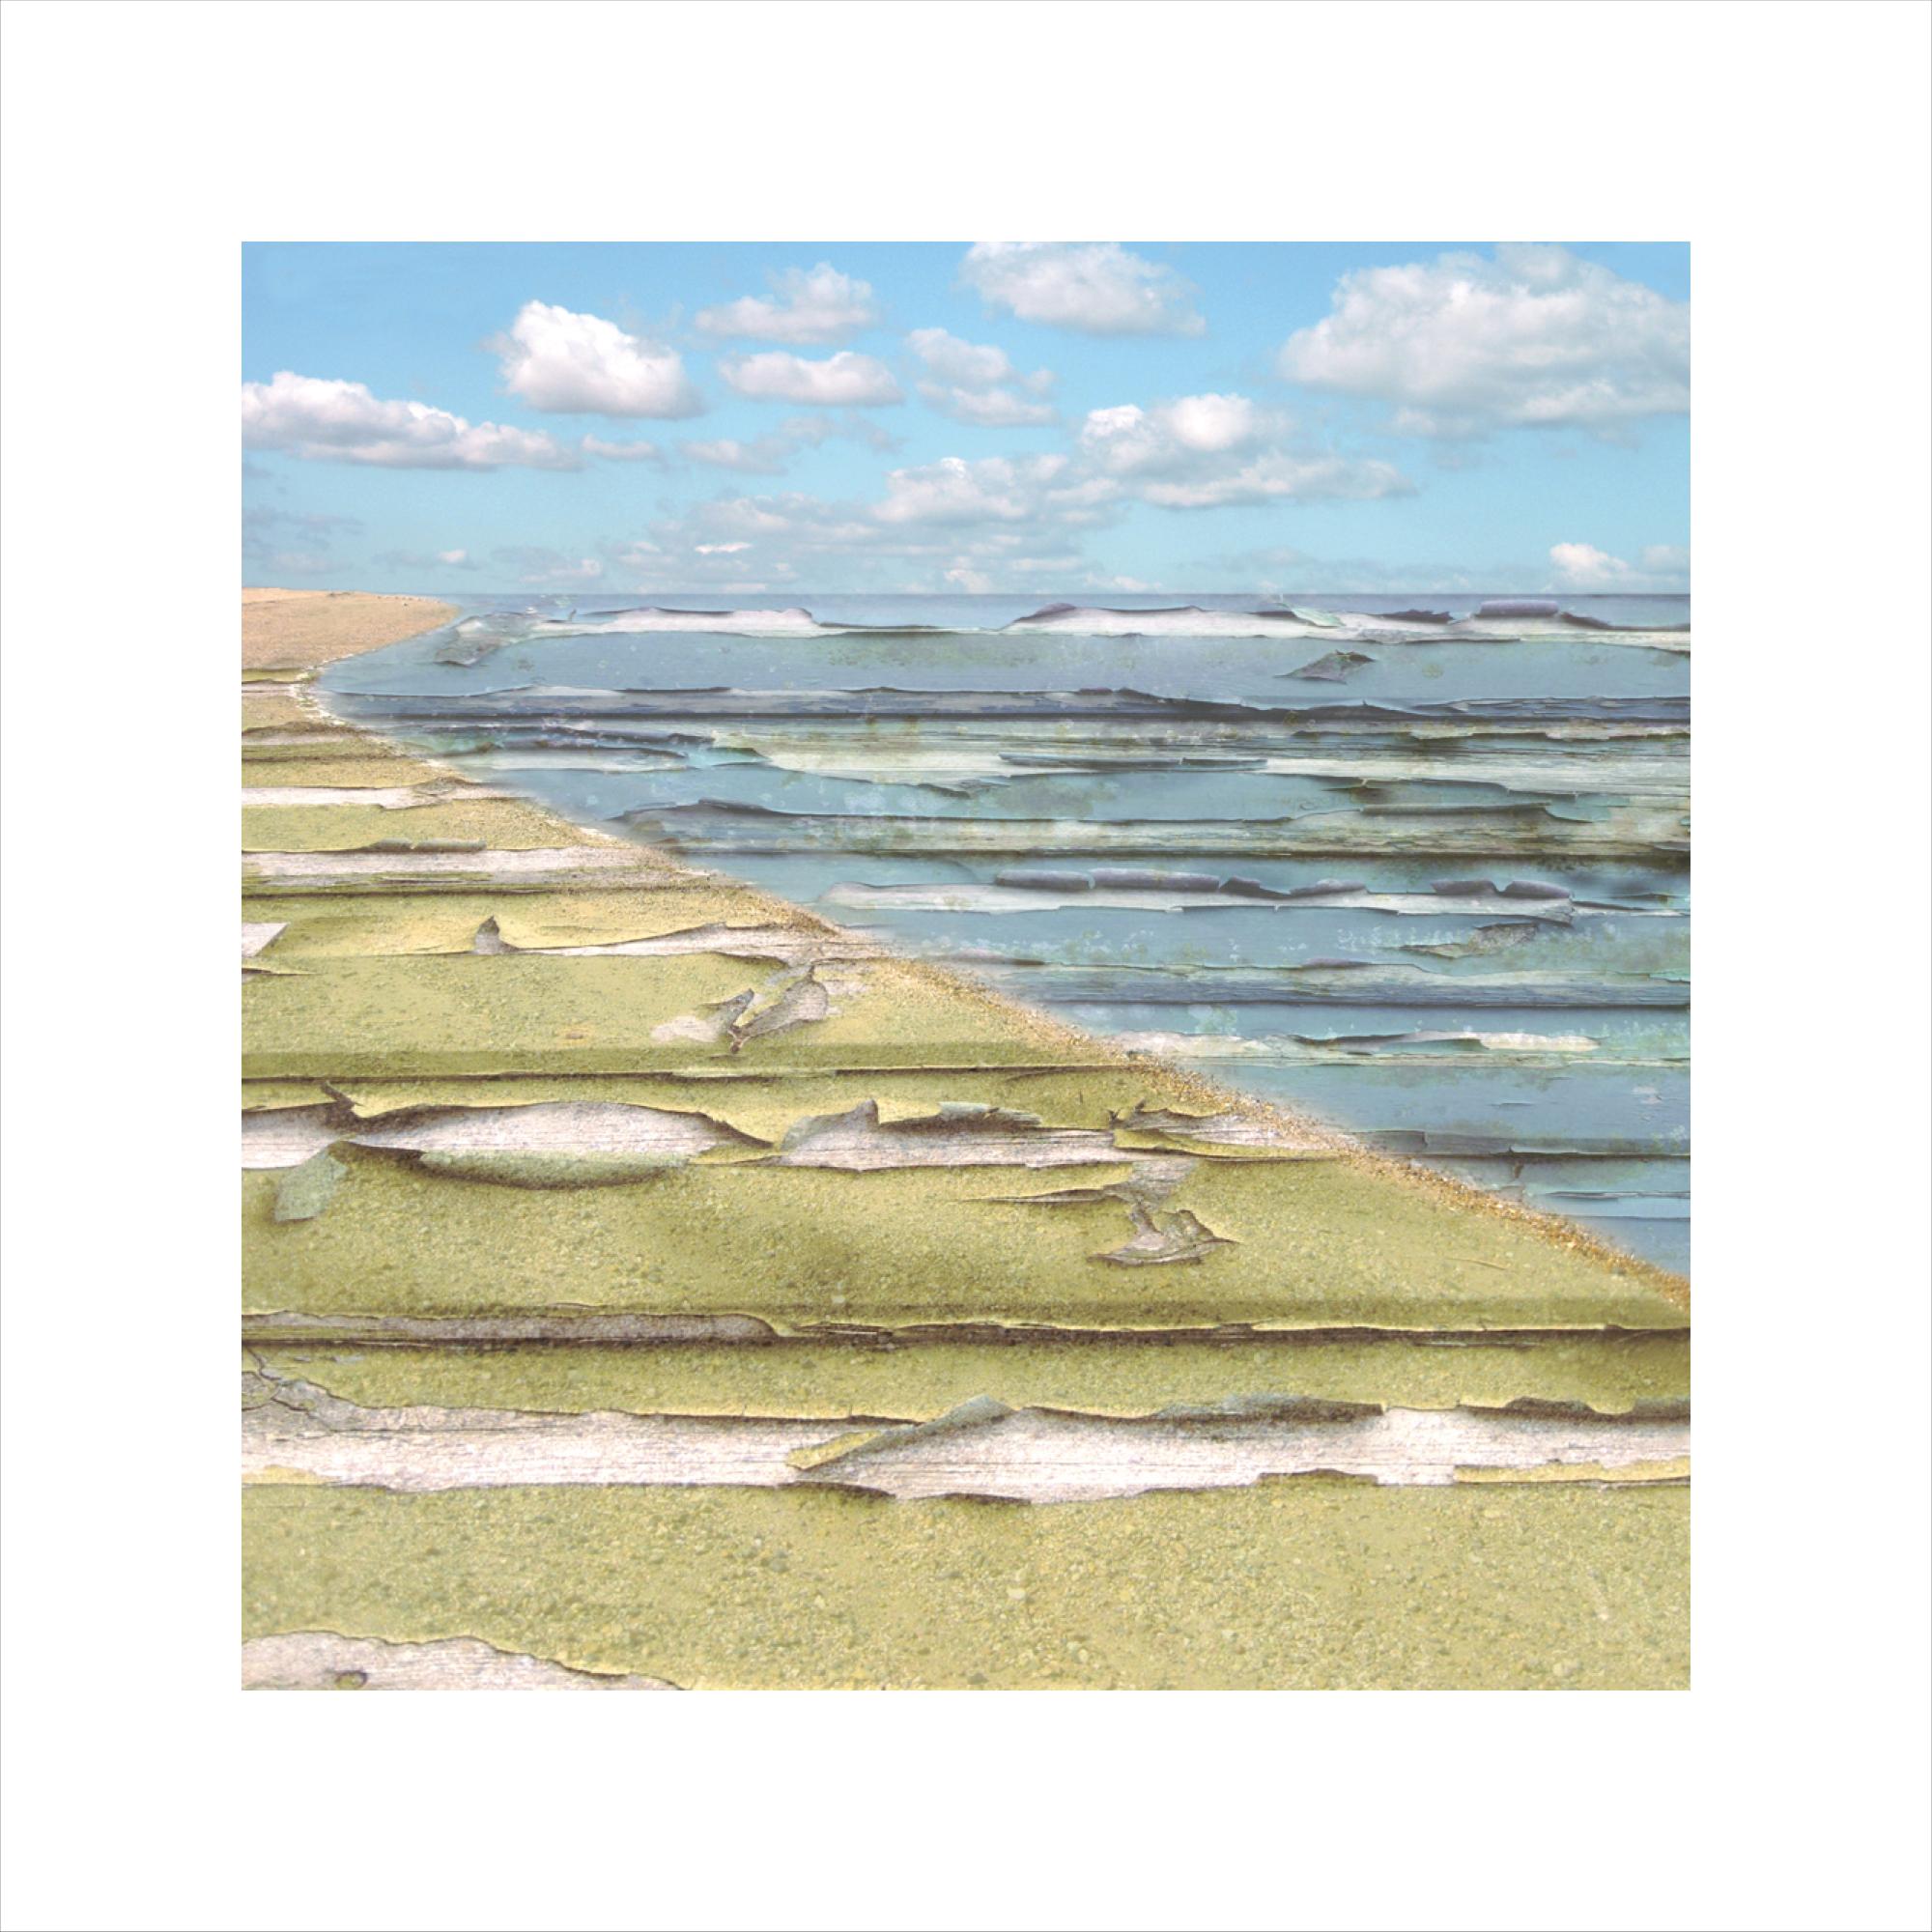 Claire Gill, Limited edition prints, digital photomontage, fine art prints, hahnemuhle, coastal art, Collect Art, seascape 4, Kand, sea, sky